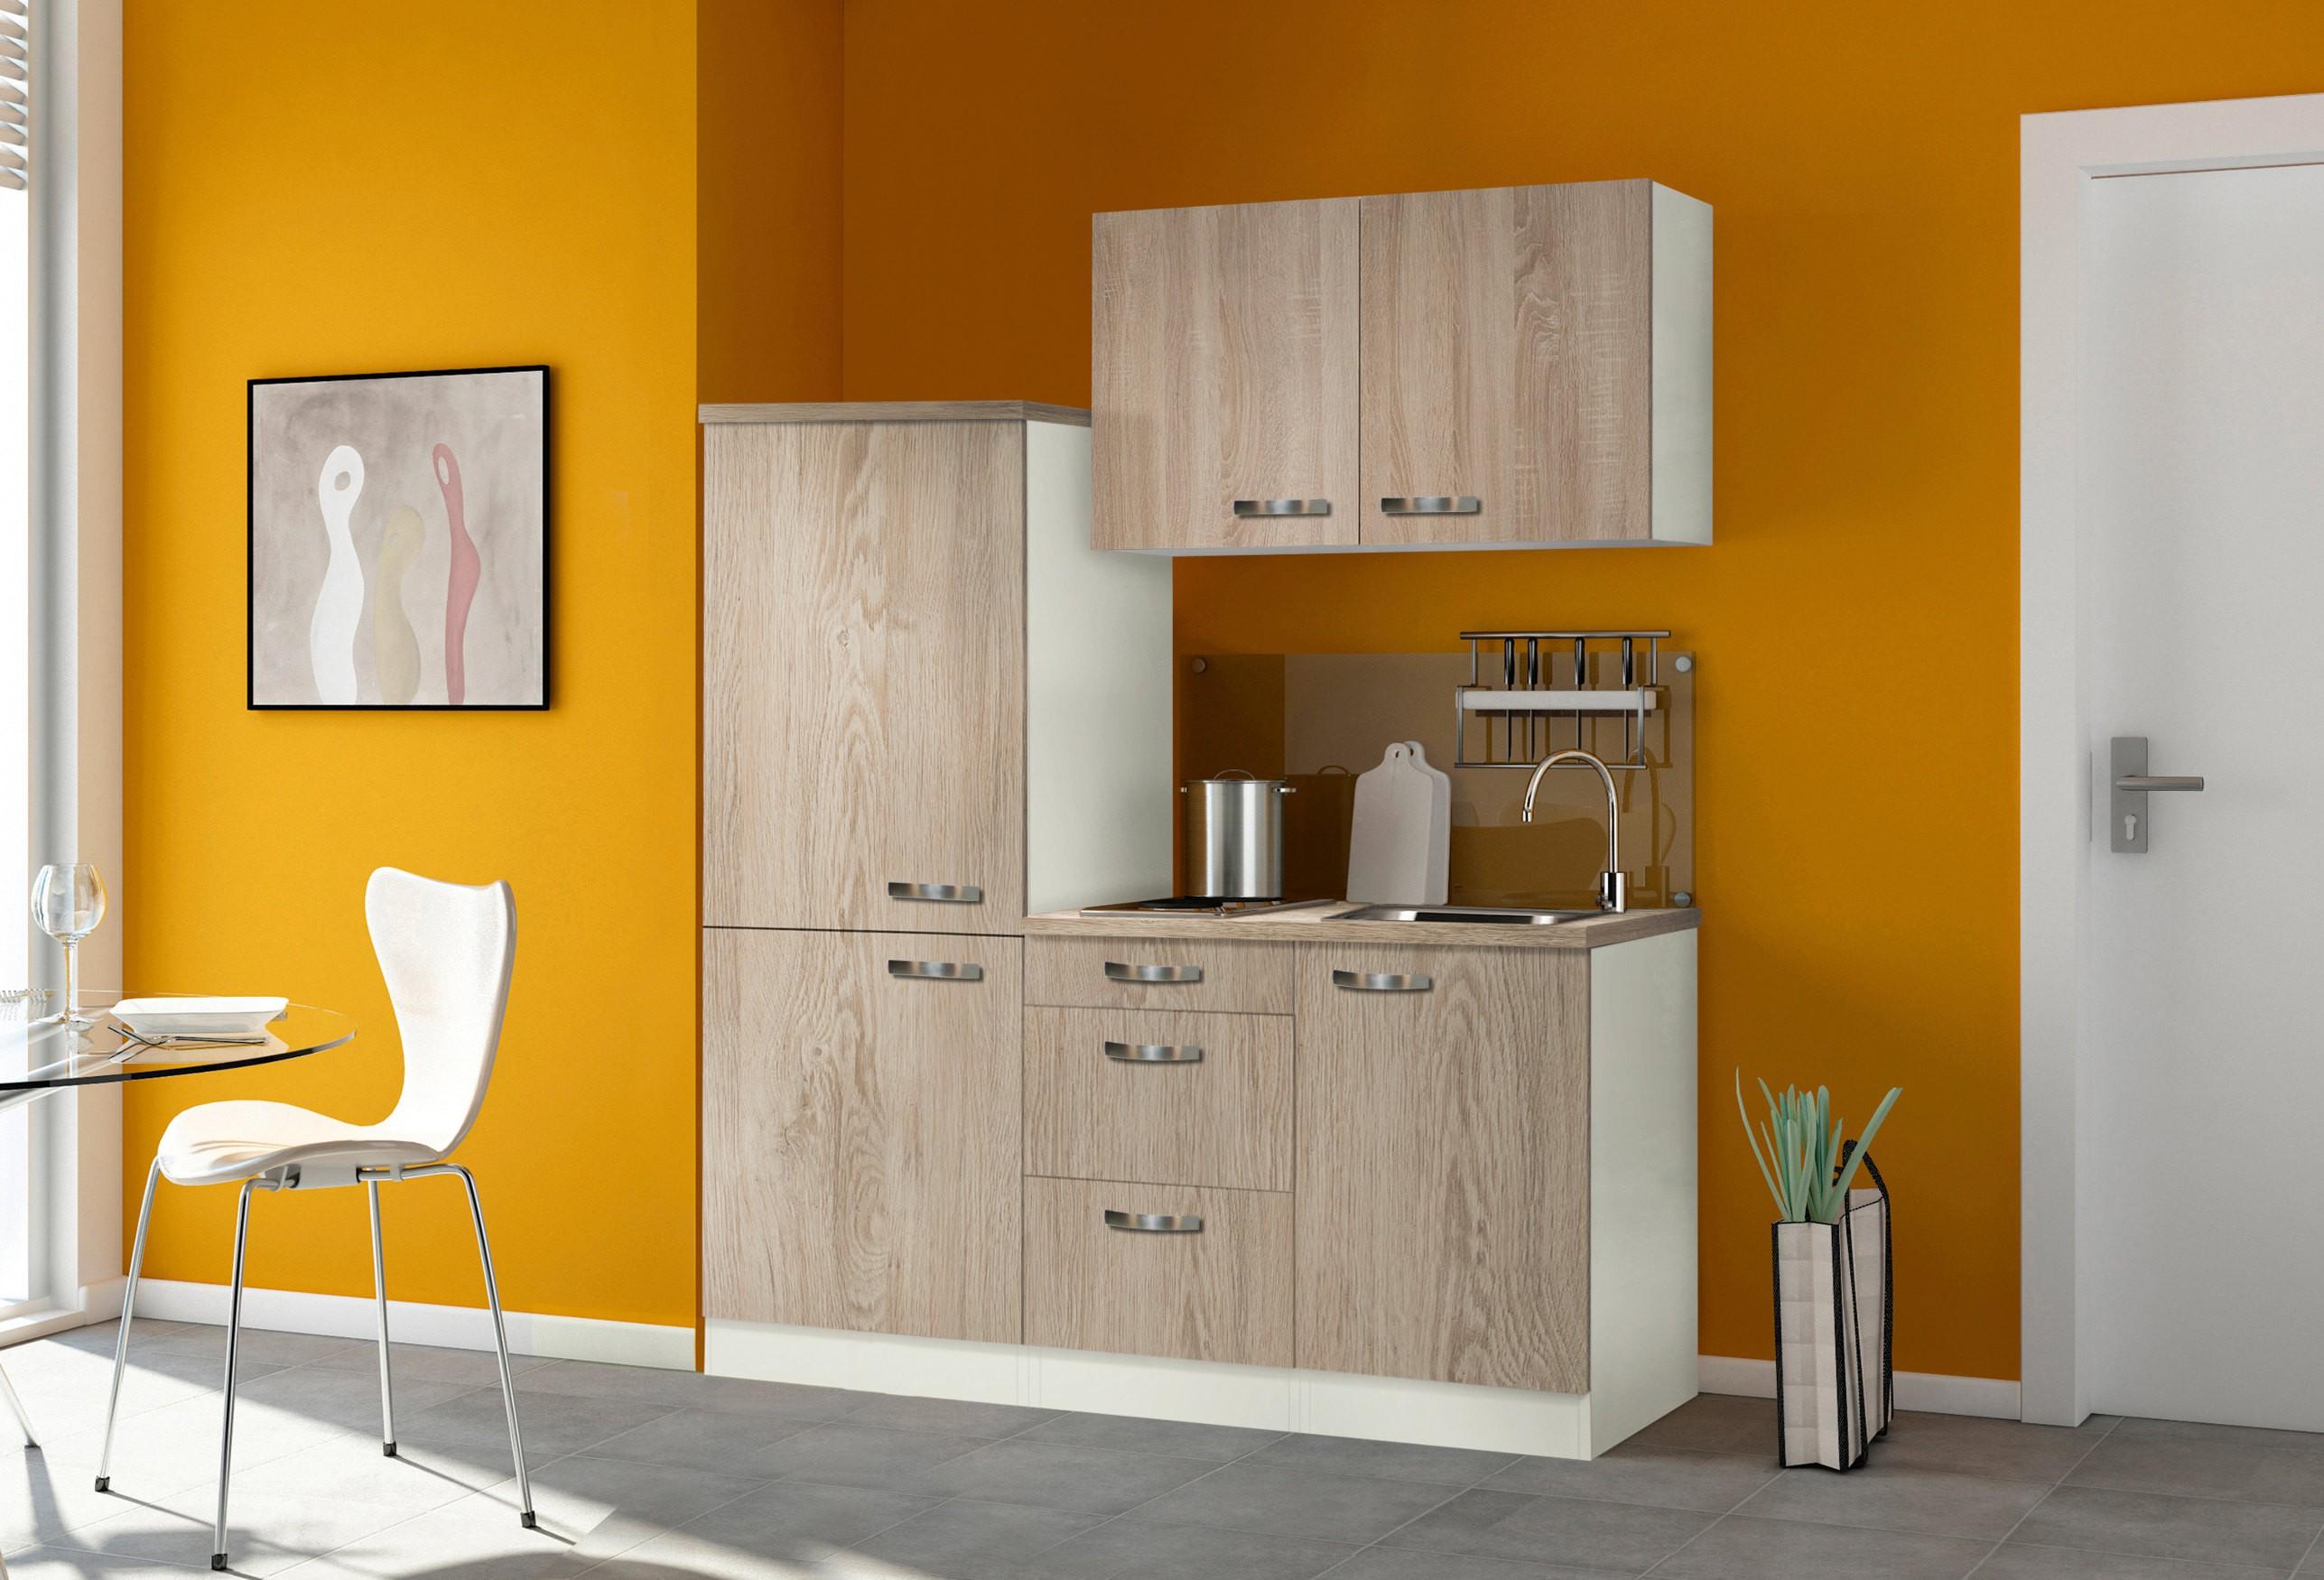 singlek che toledo mit elektro kochfeld breite 160 cm eiche k che singlek chen. Black Bedroom Furniture Sets. Home Design Ideas